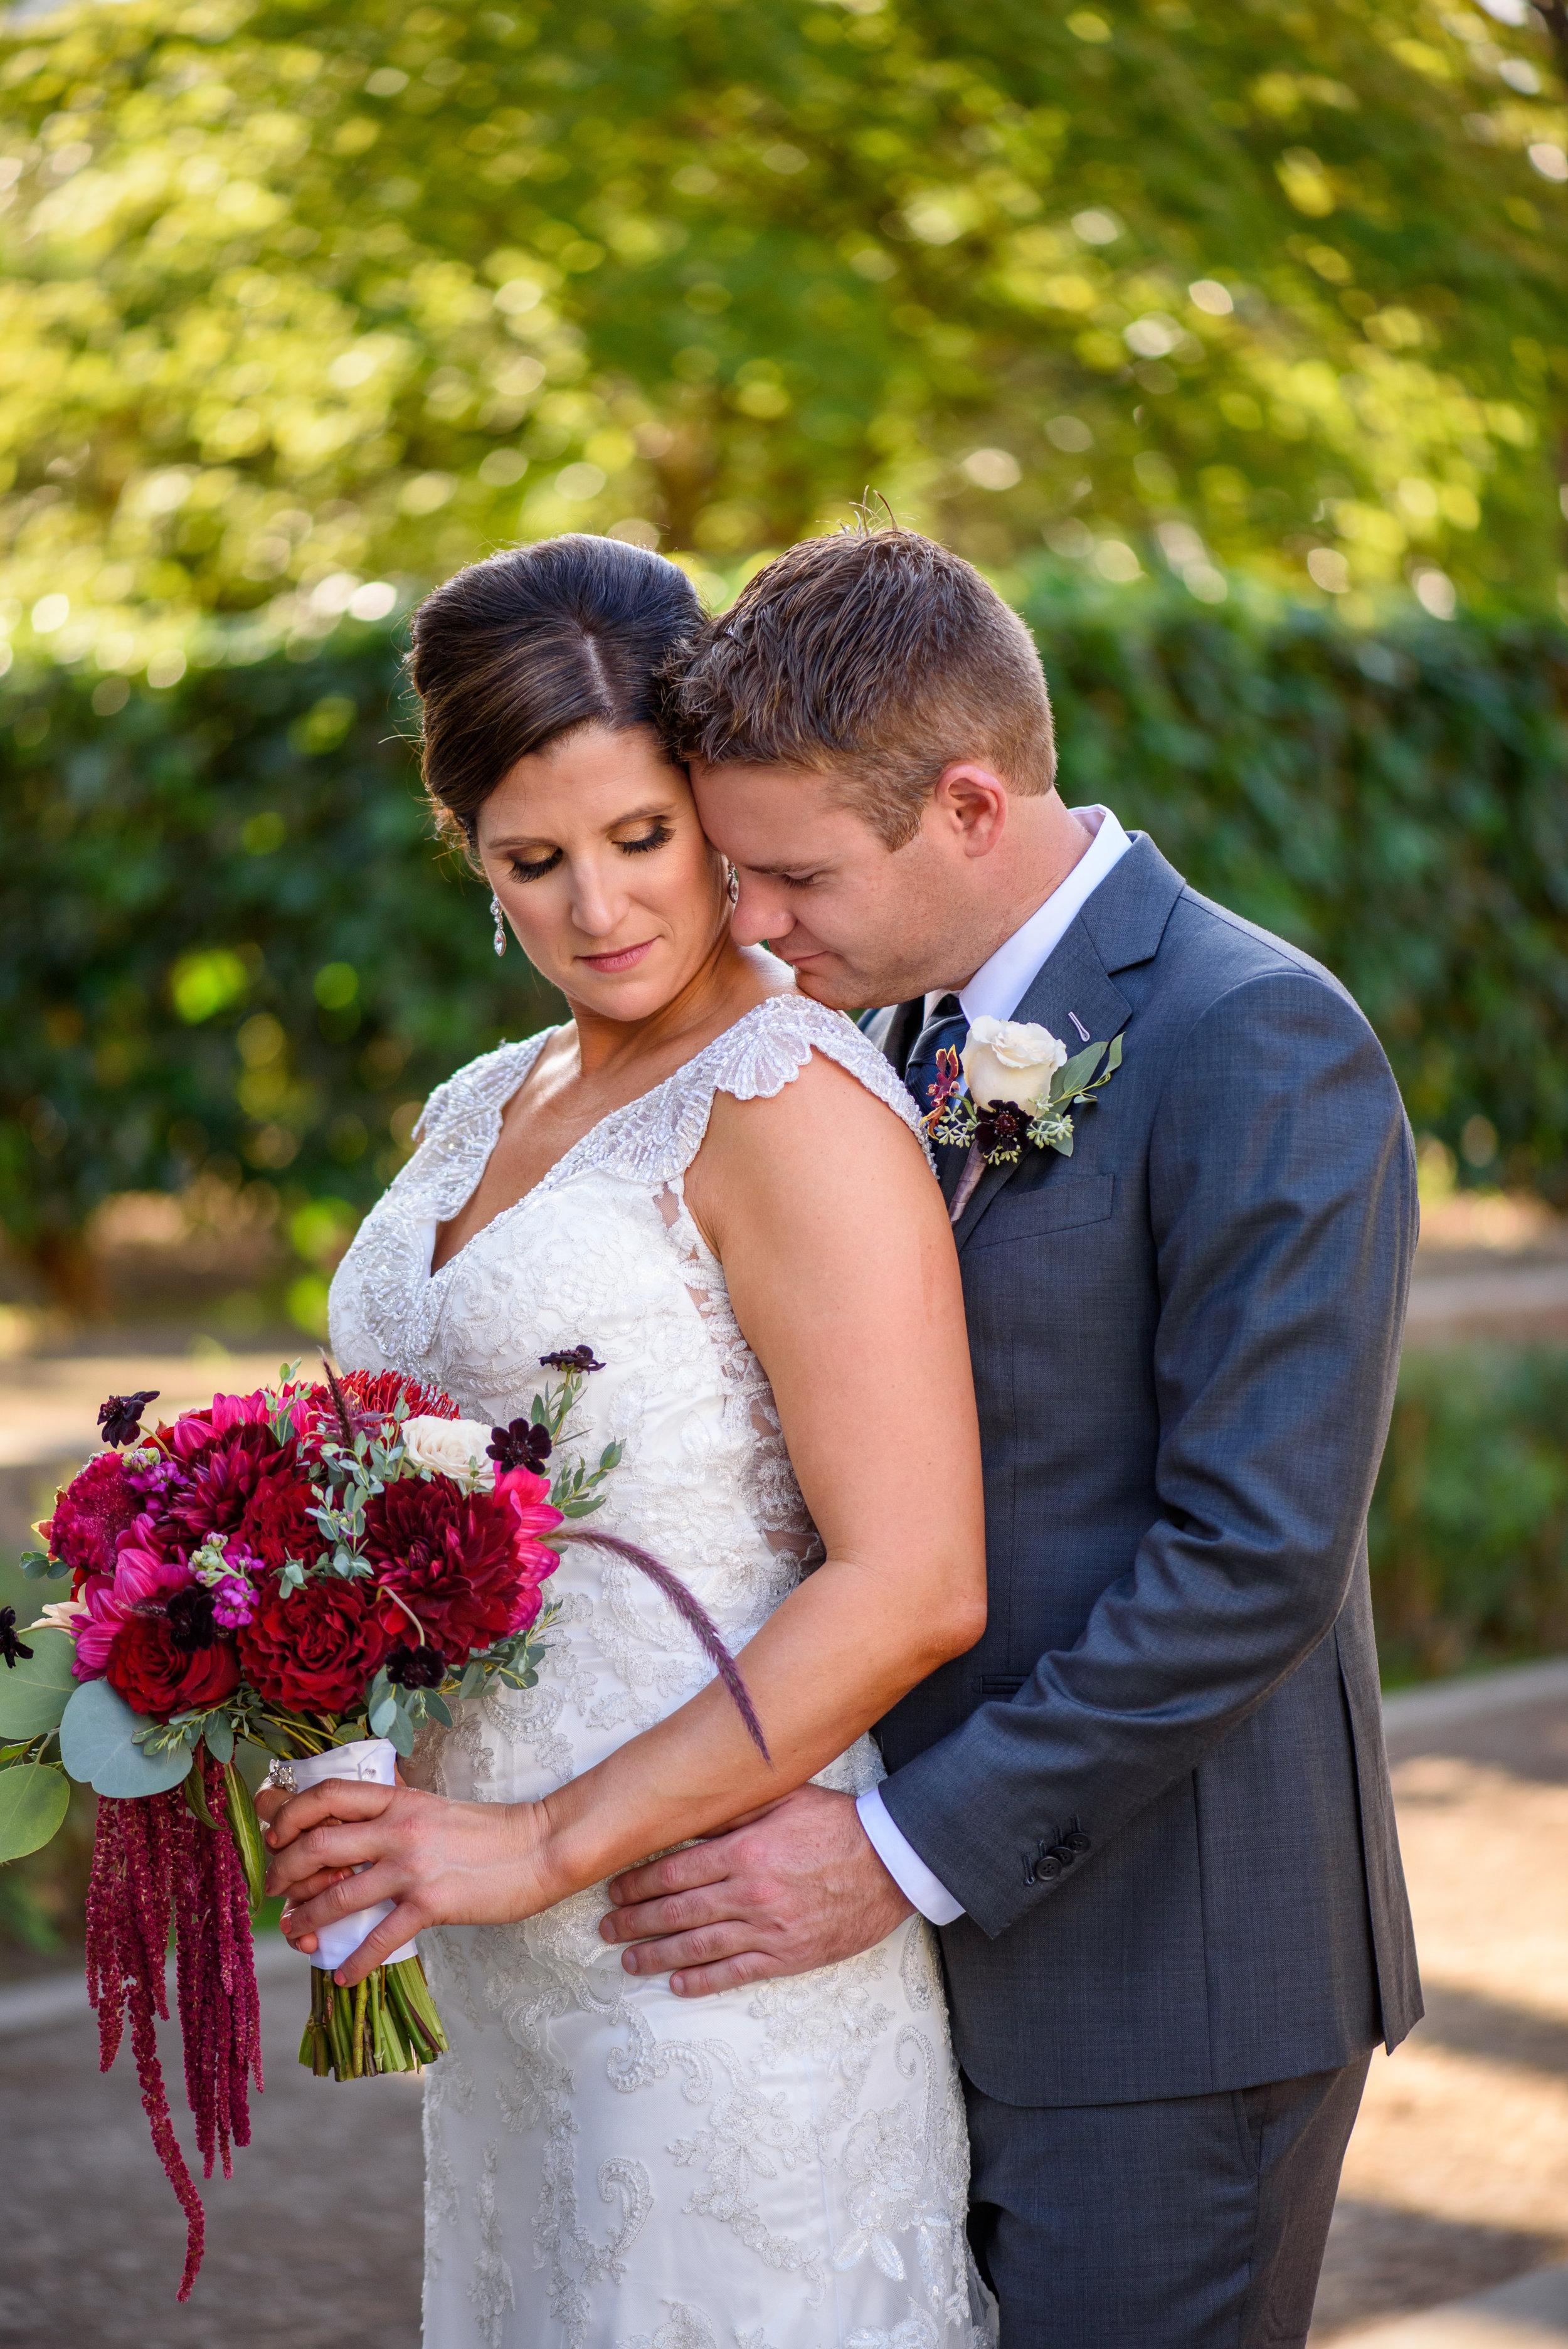 annie-brian-019-antiquite-midtown-sacramento-wedding-photographer-katherine-nicole-photography.JPG